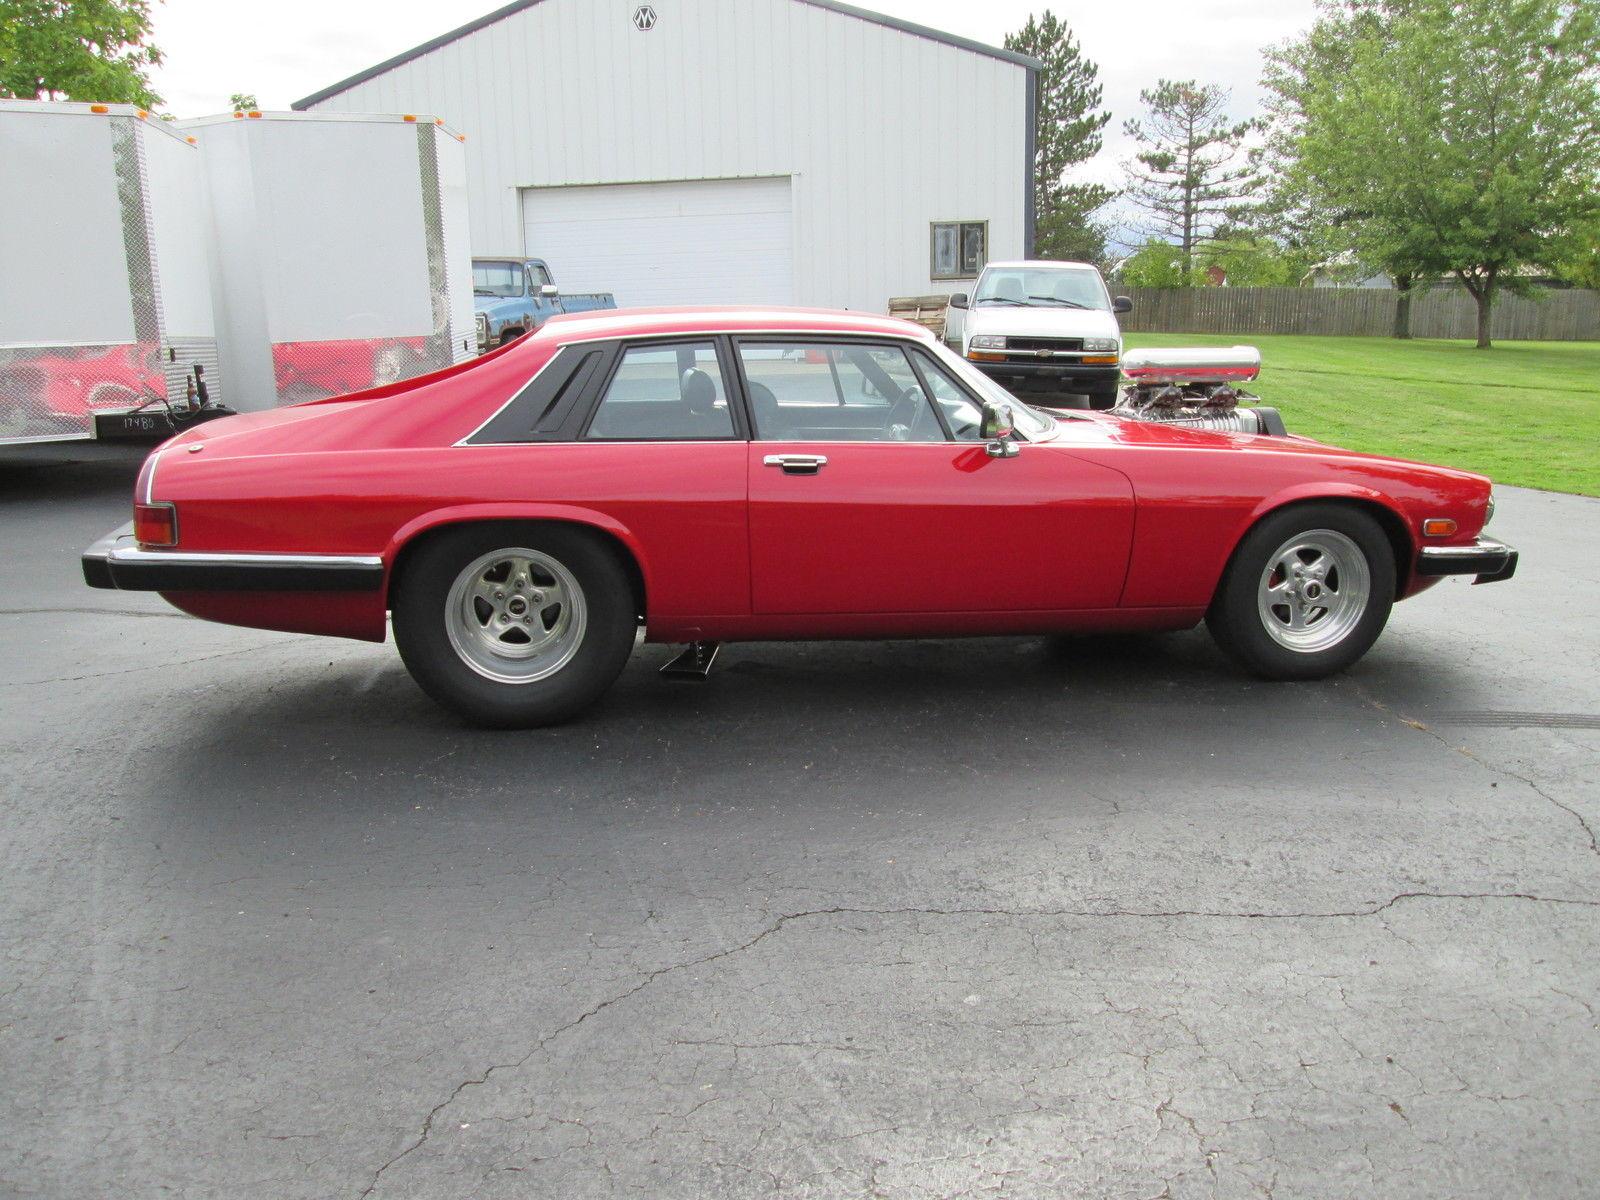 pro street blown 383 chevy stroker jaguar xjs 1983 coupe